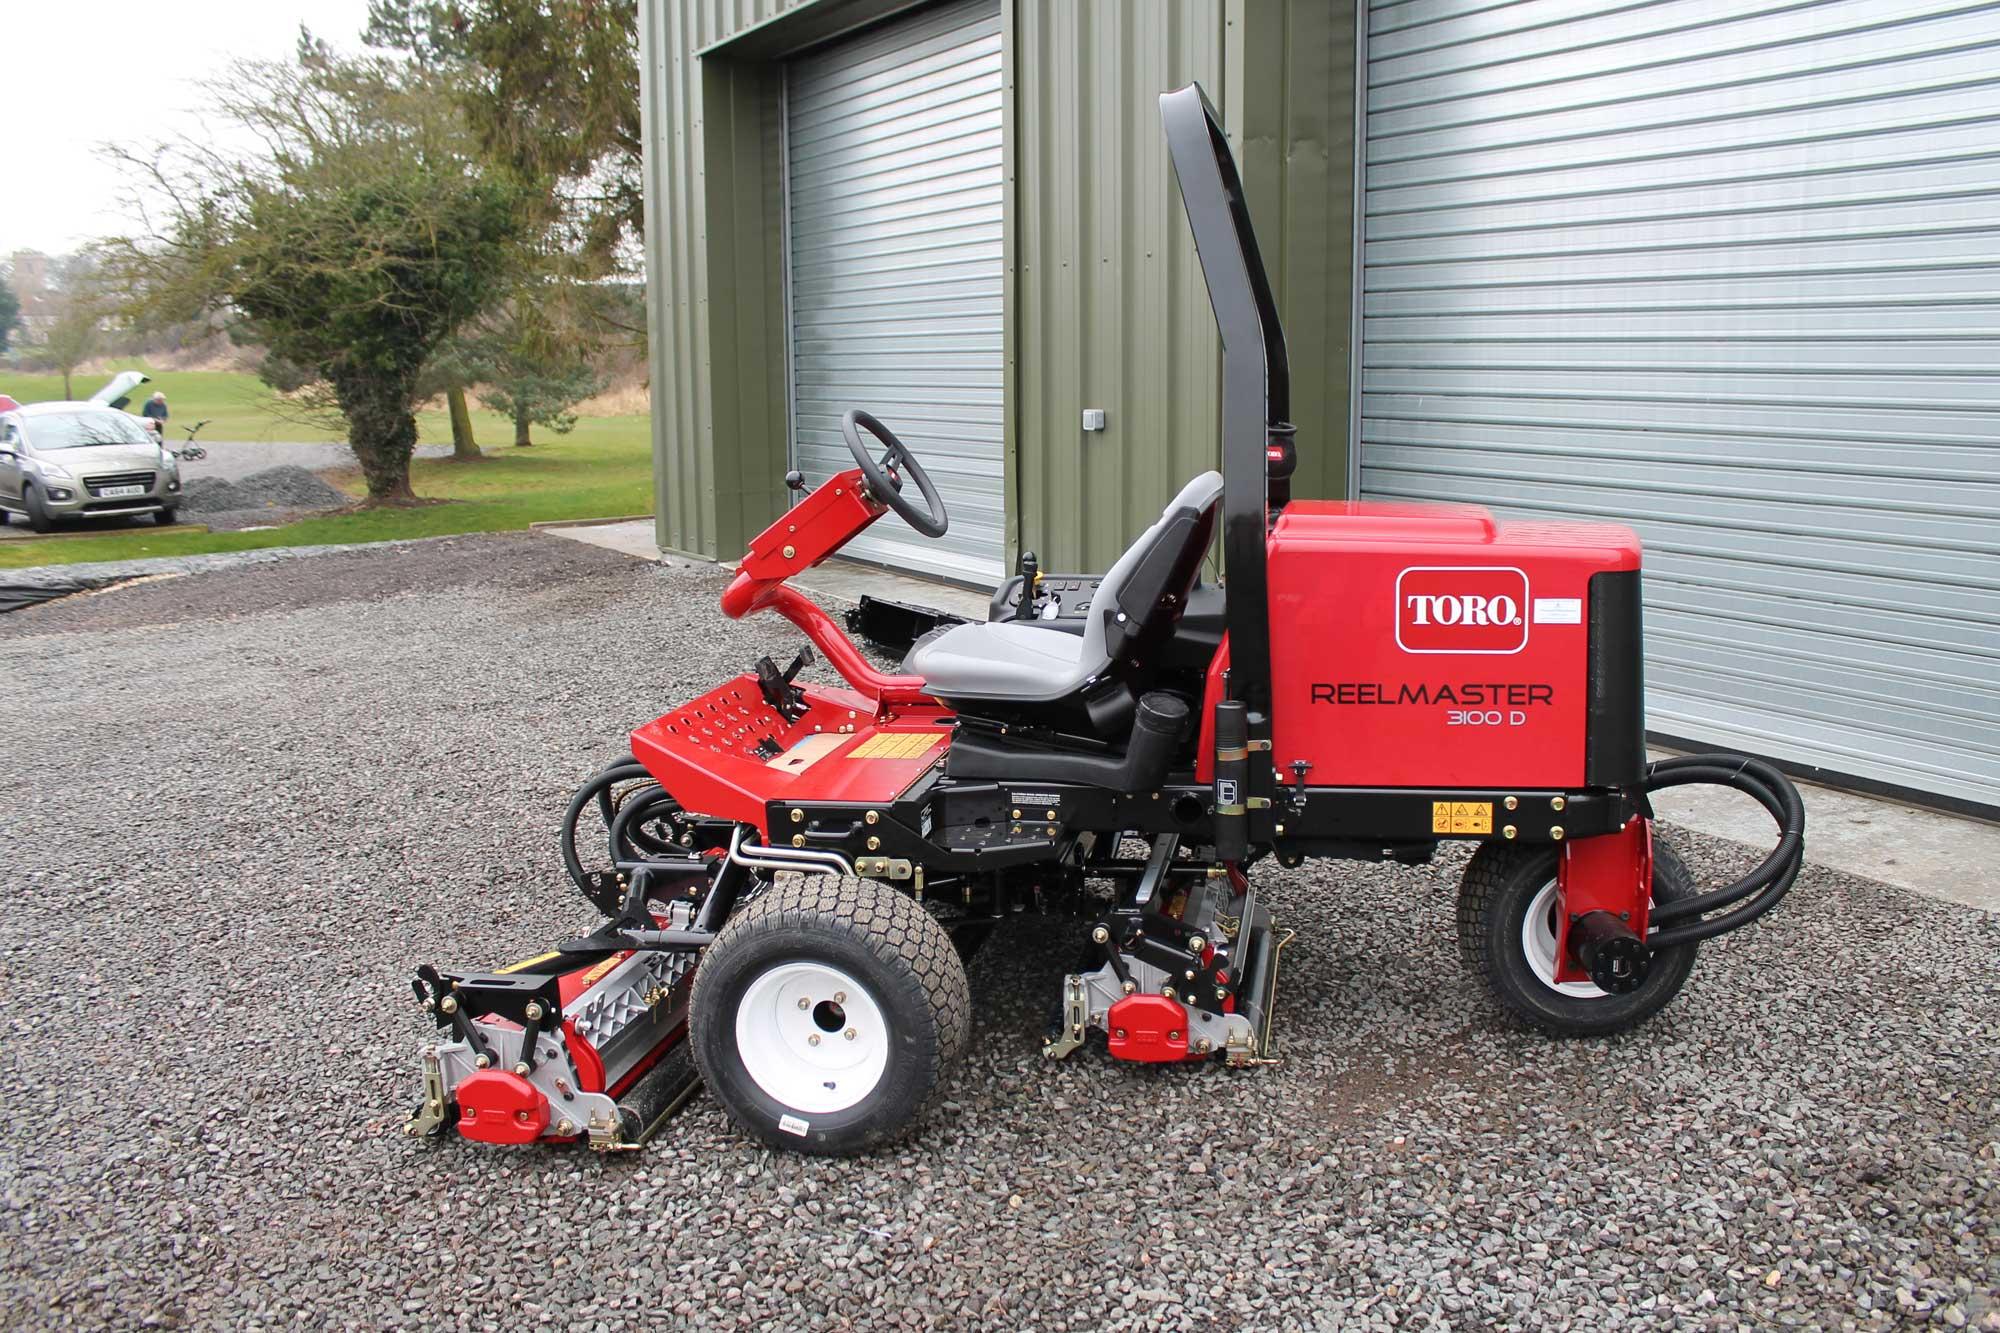 toro reelmaster 6500 d 6700 d kubota engine mower service repair workshop manual download